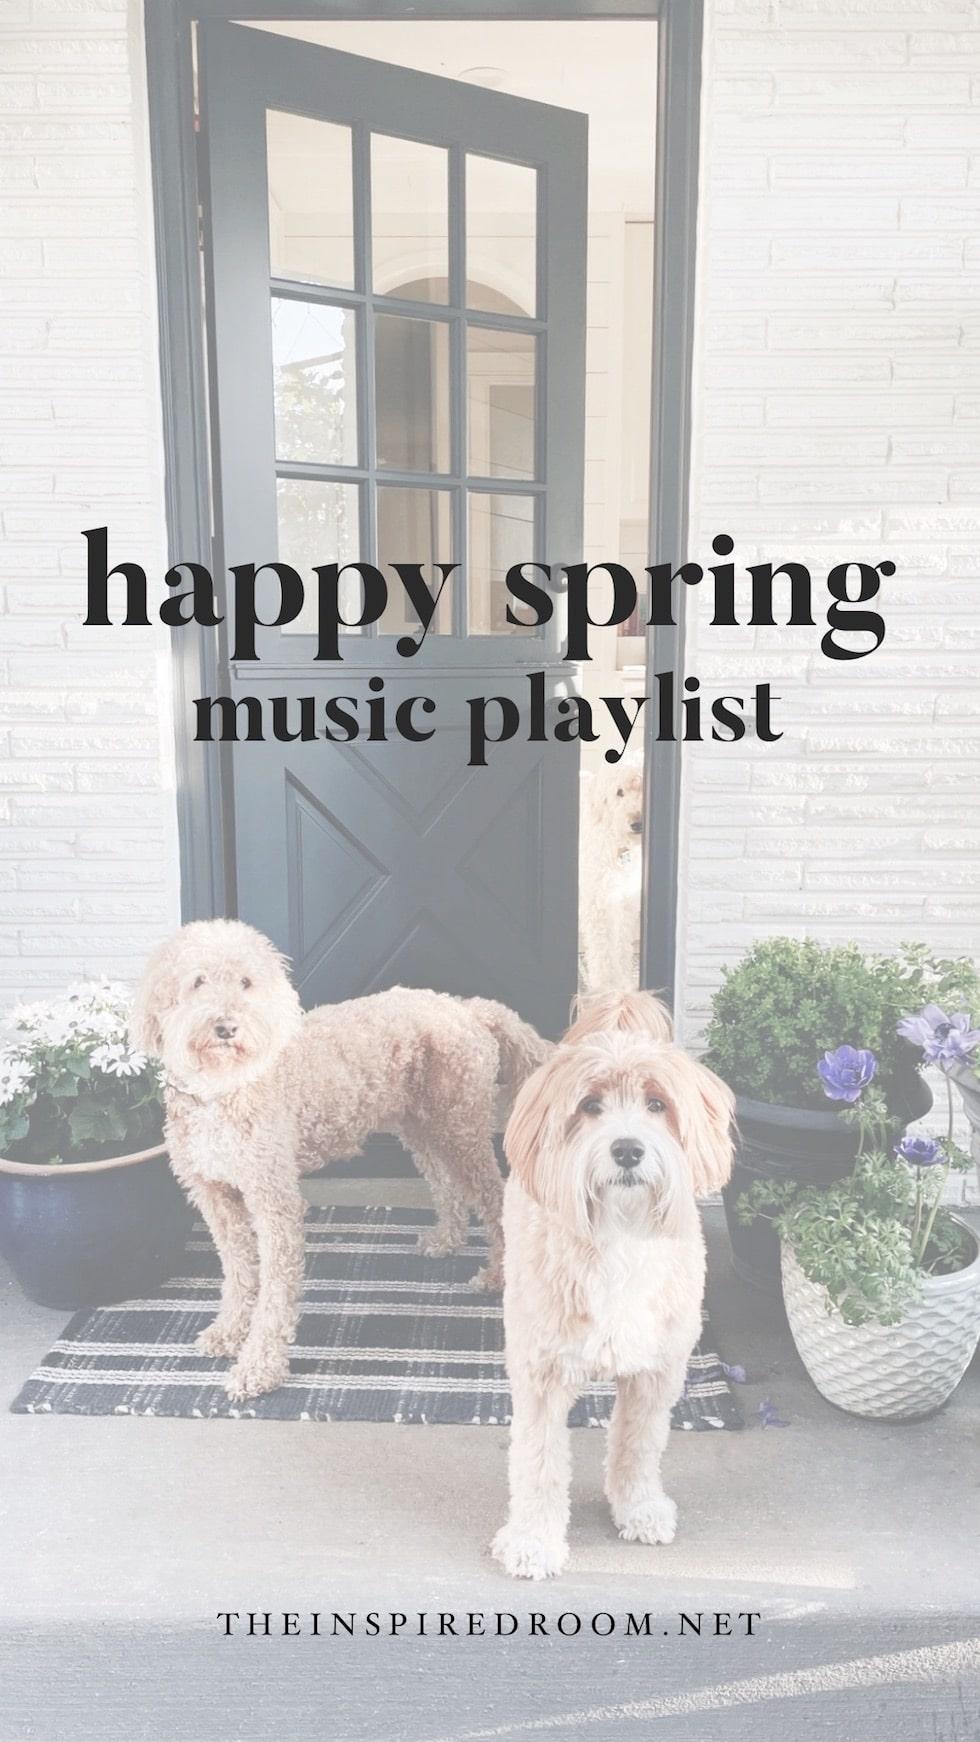 Happy Spring Music Playlist